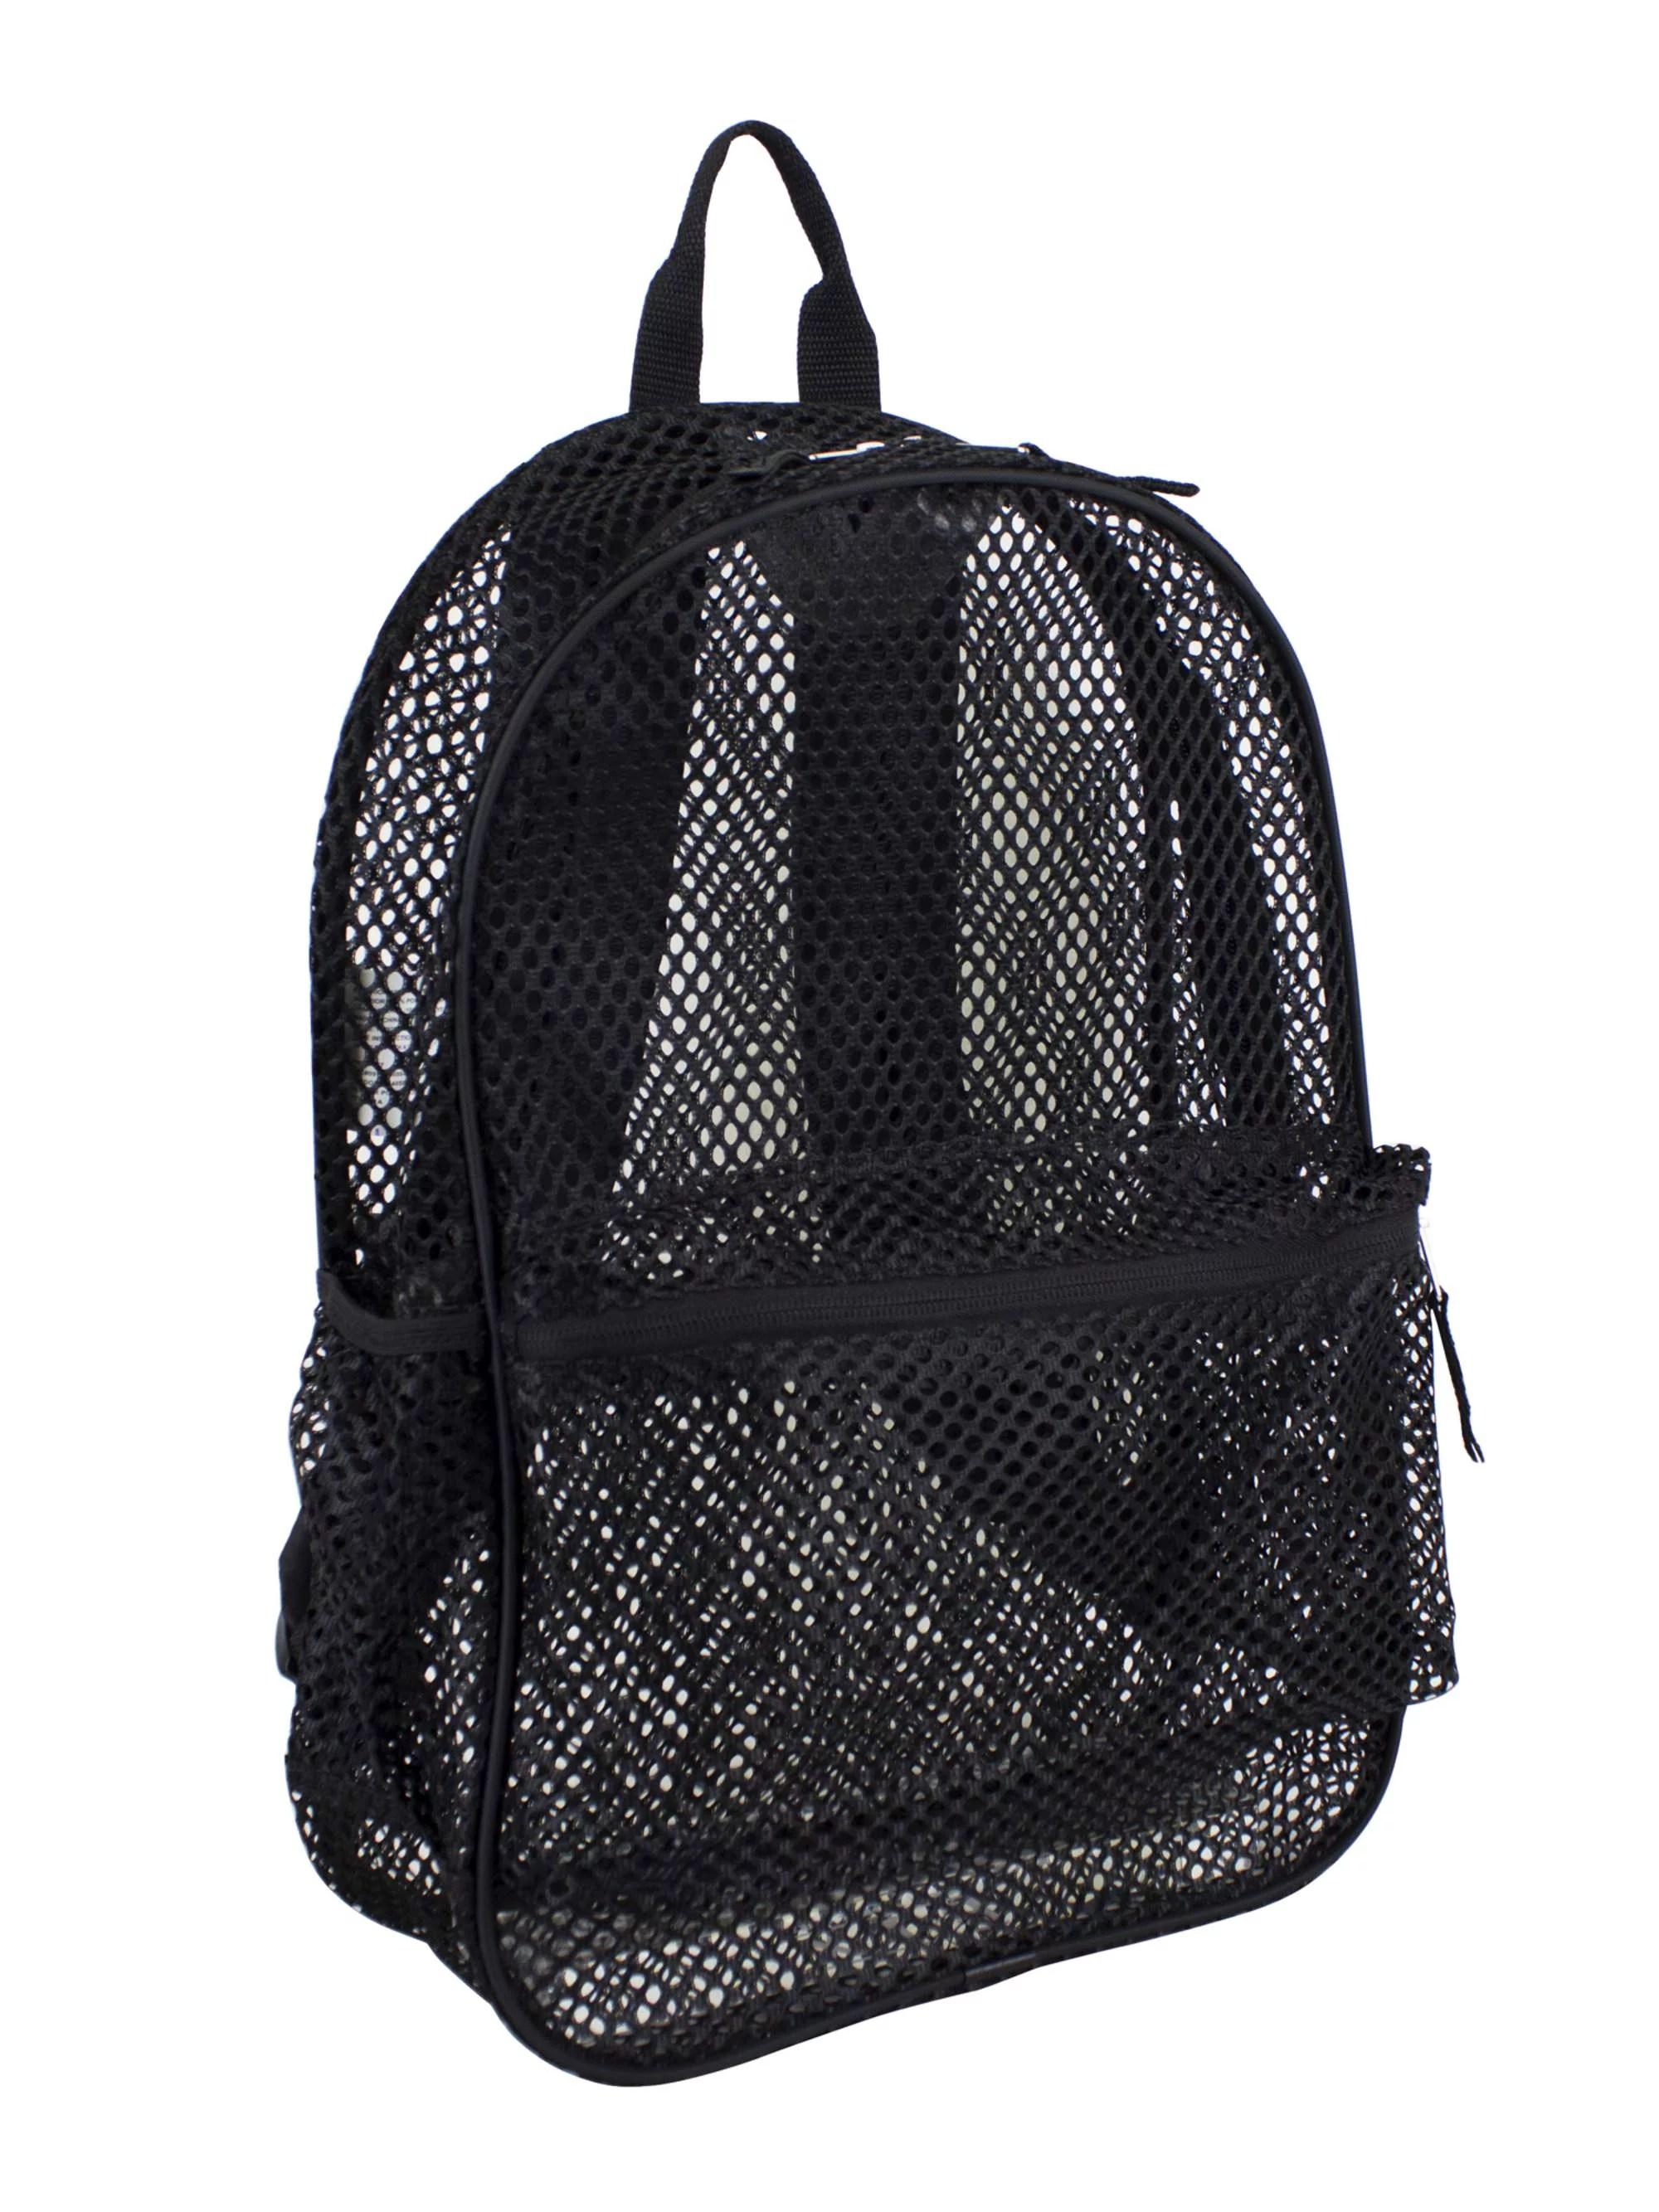 Eastsport Mesh Backpack with Padded Adjustable Straps